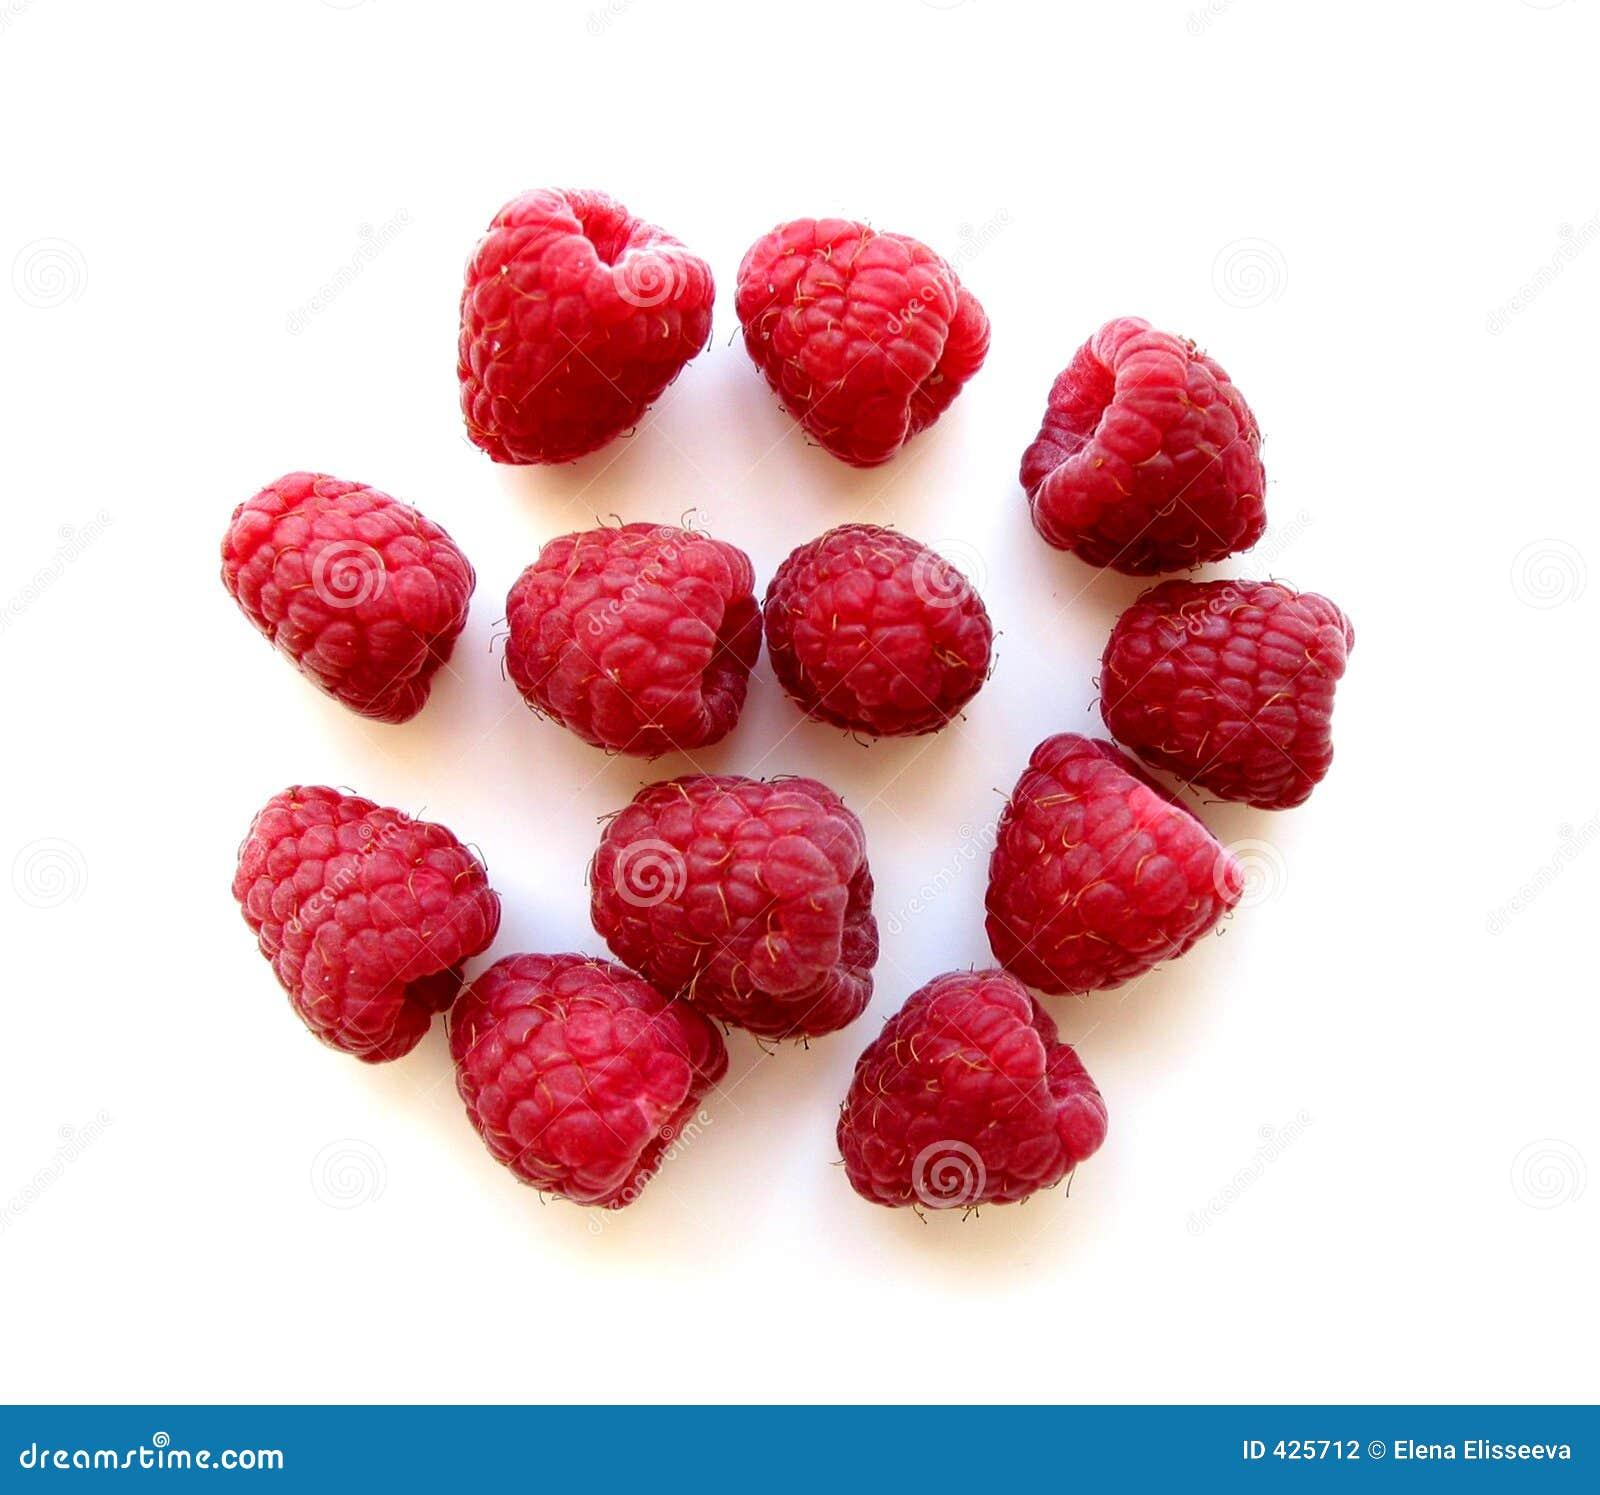 Raspberries on white 1